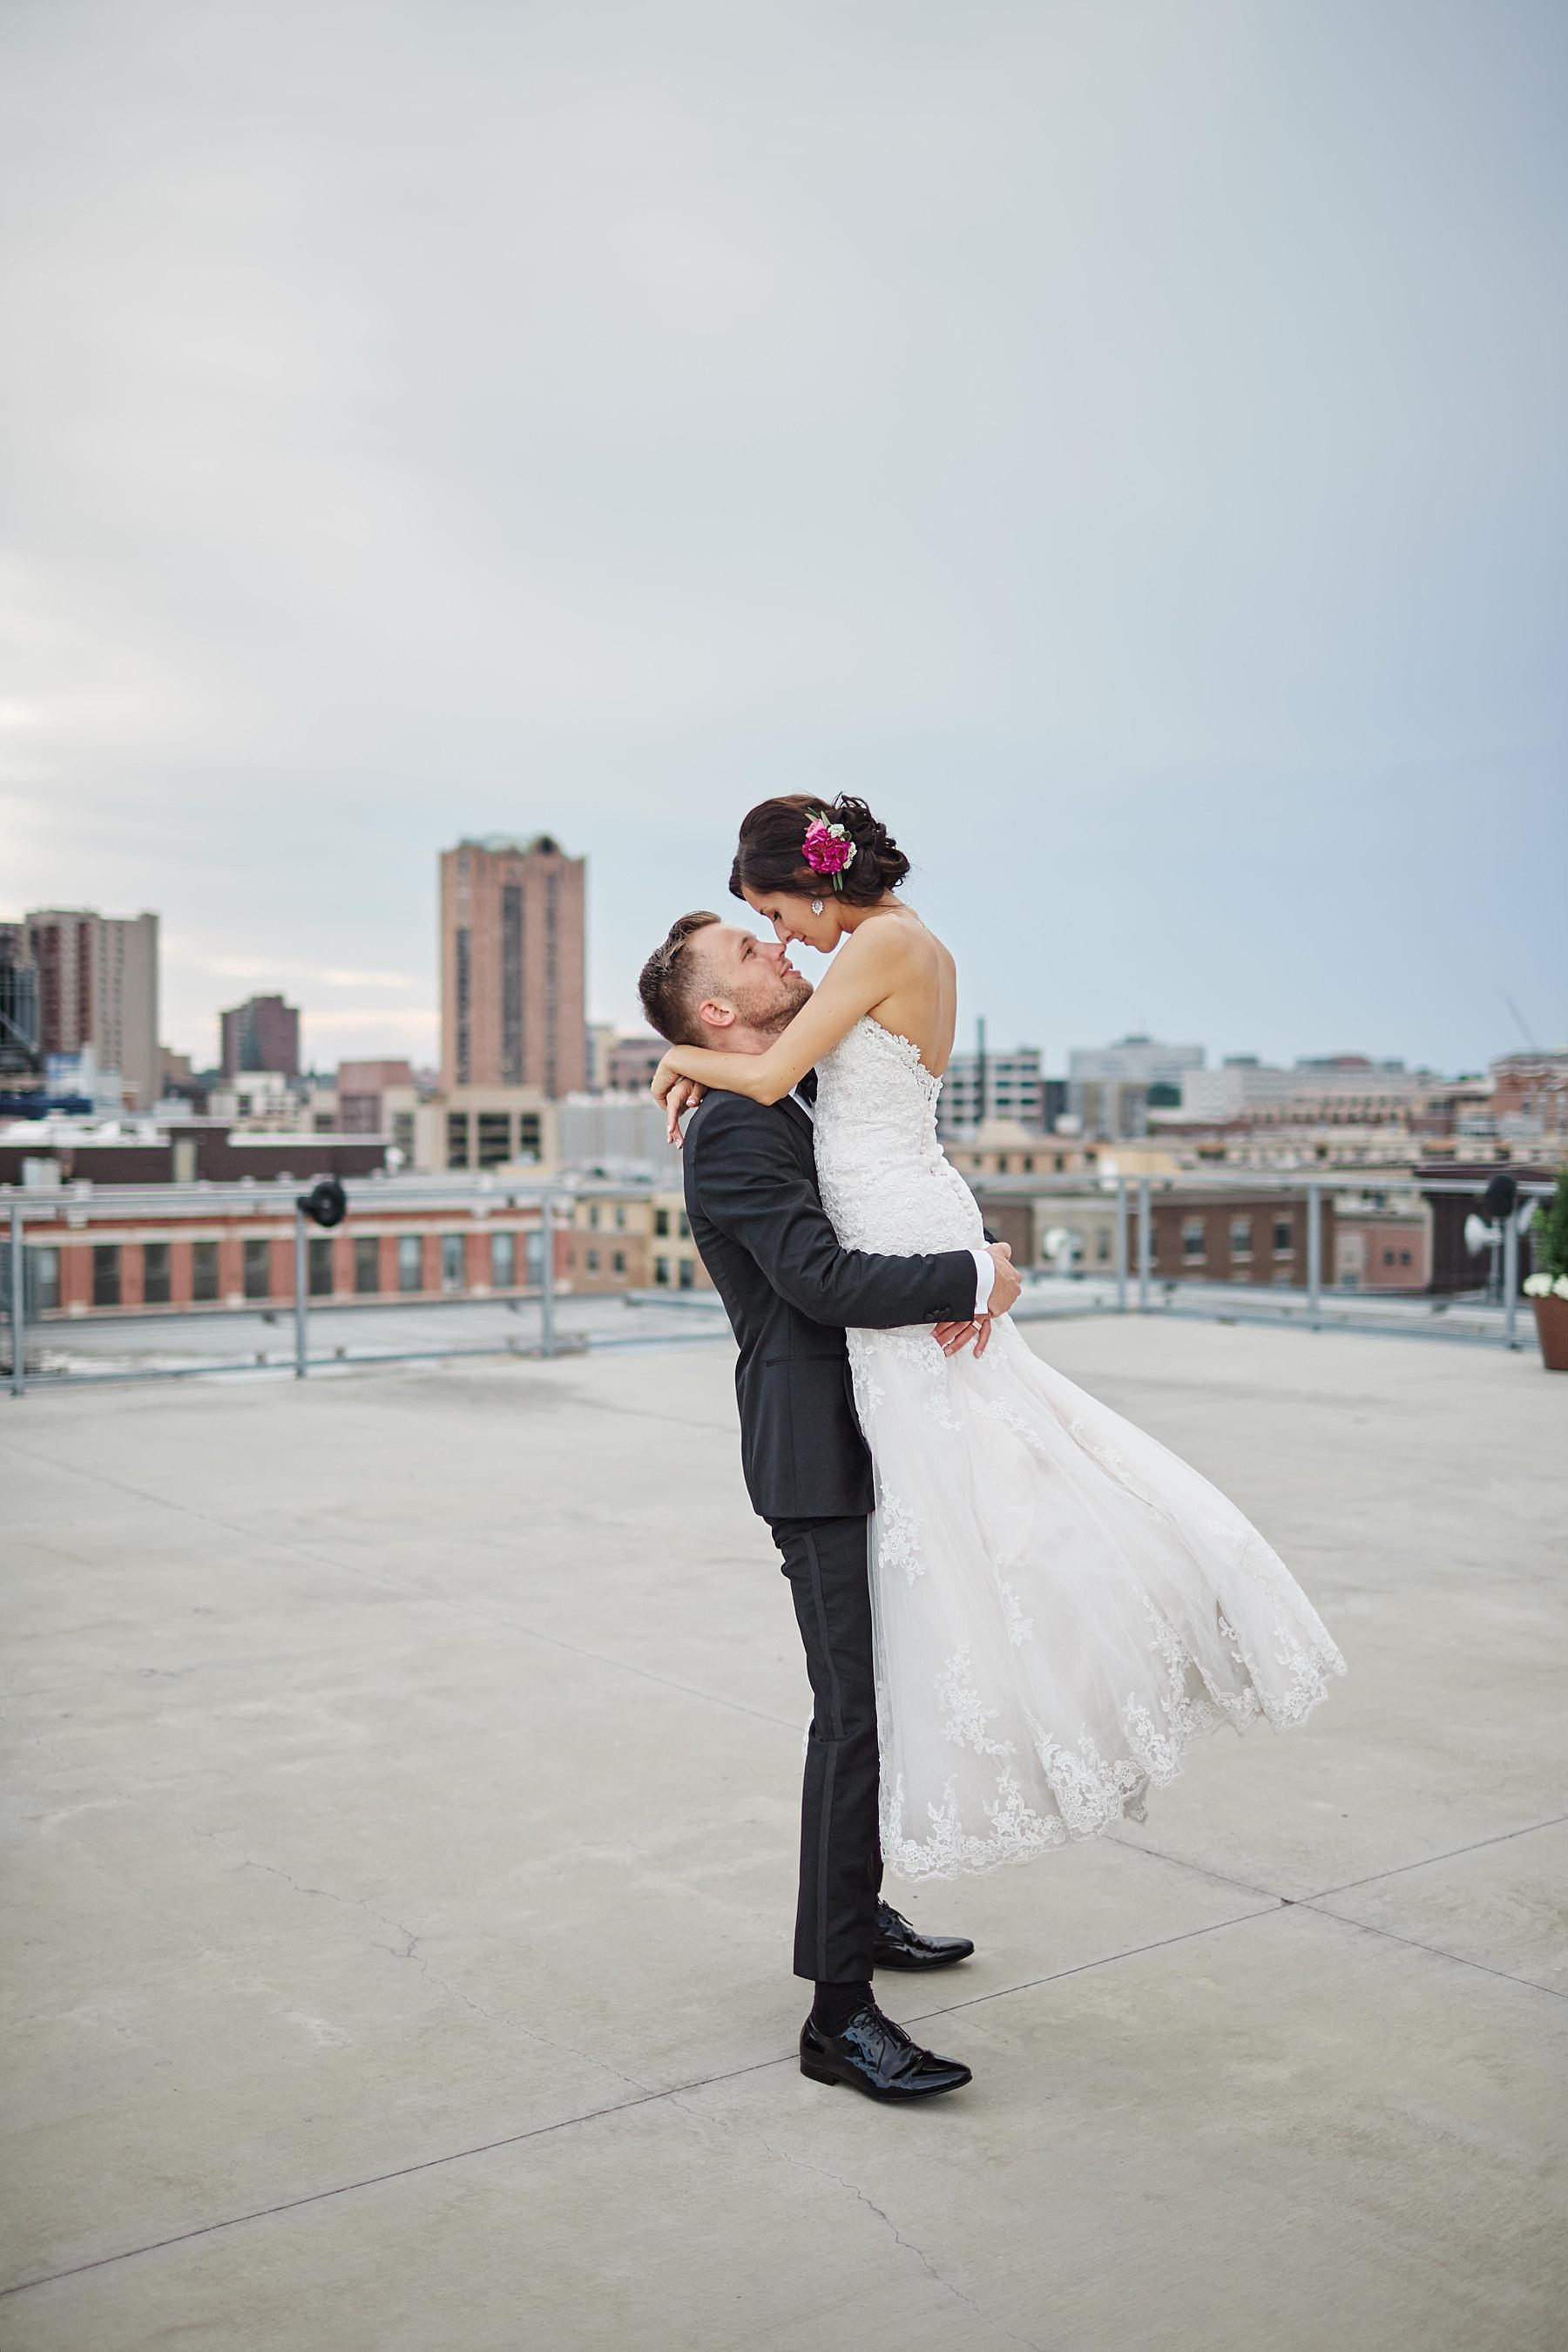 ABULAE-Wedding-Saint-paul-MN-Josh-Sofia-Wedding-Mears-Park_0823.jpg